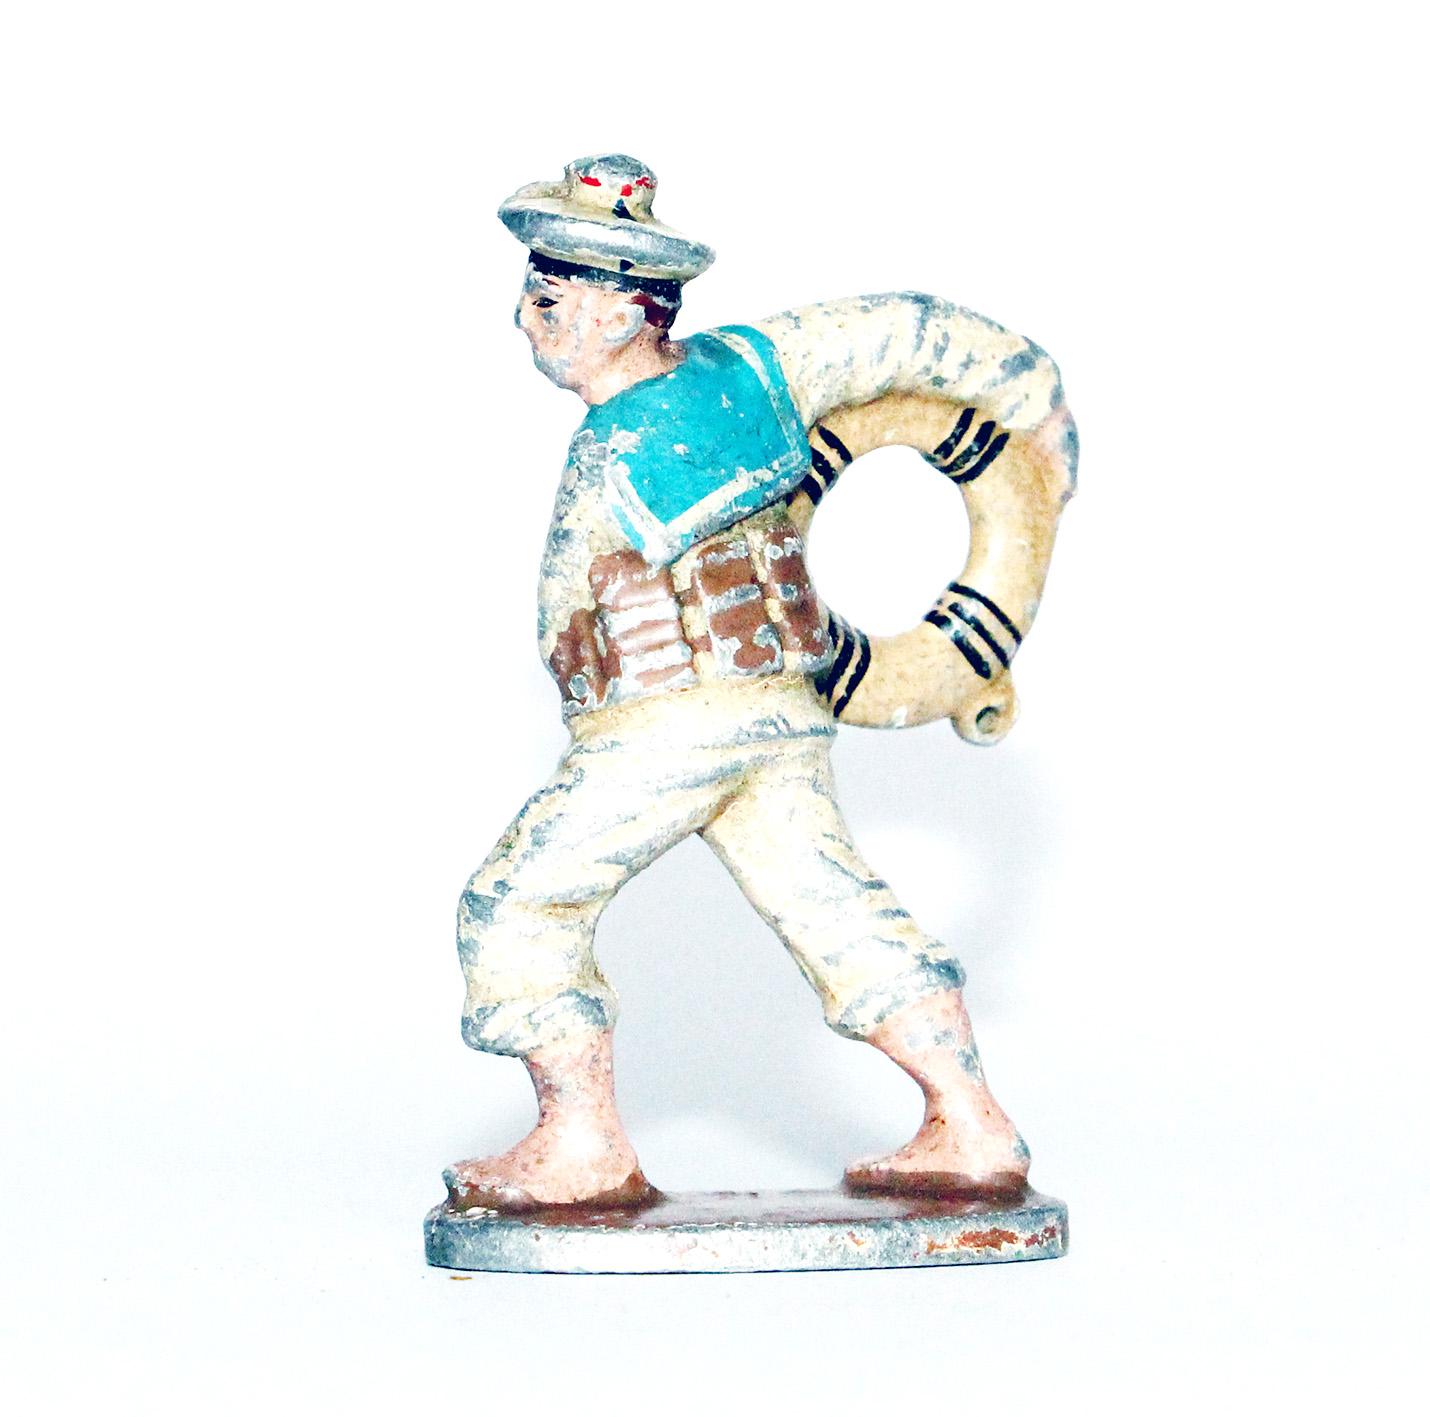 Figurines Marin Militaire Quiralu